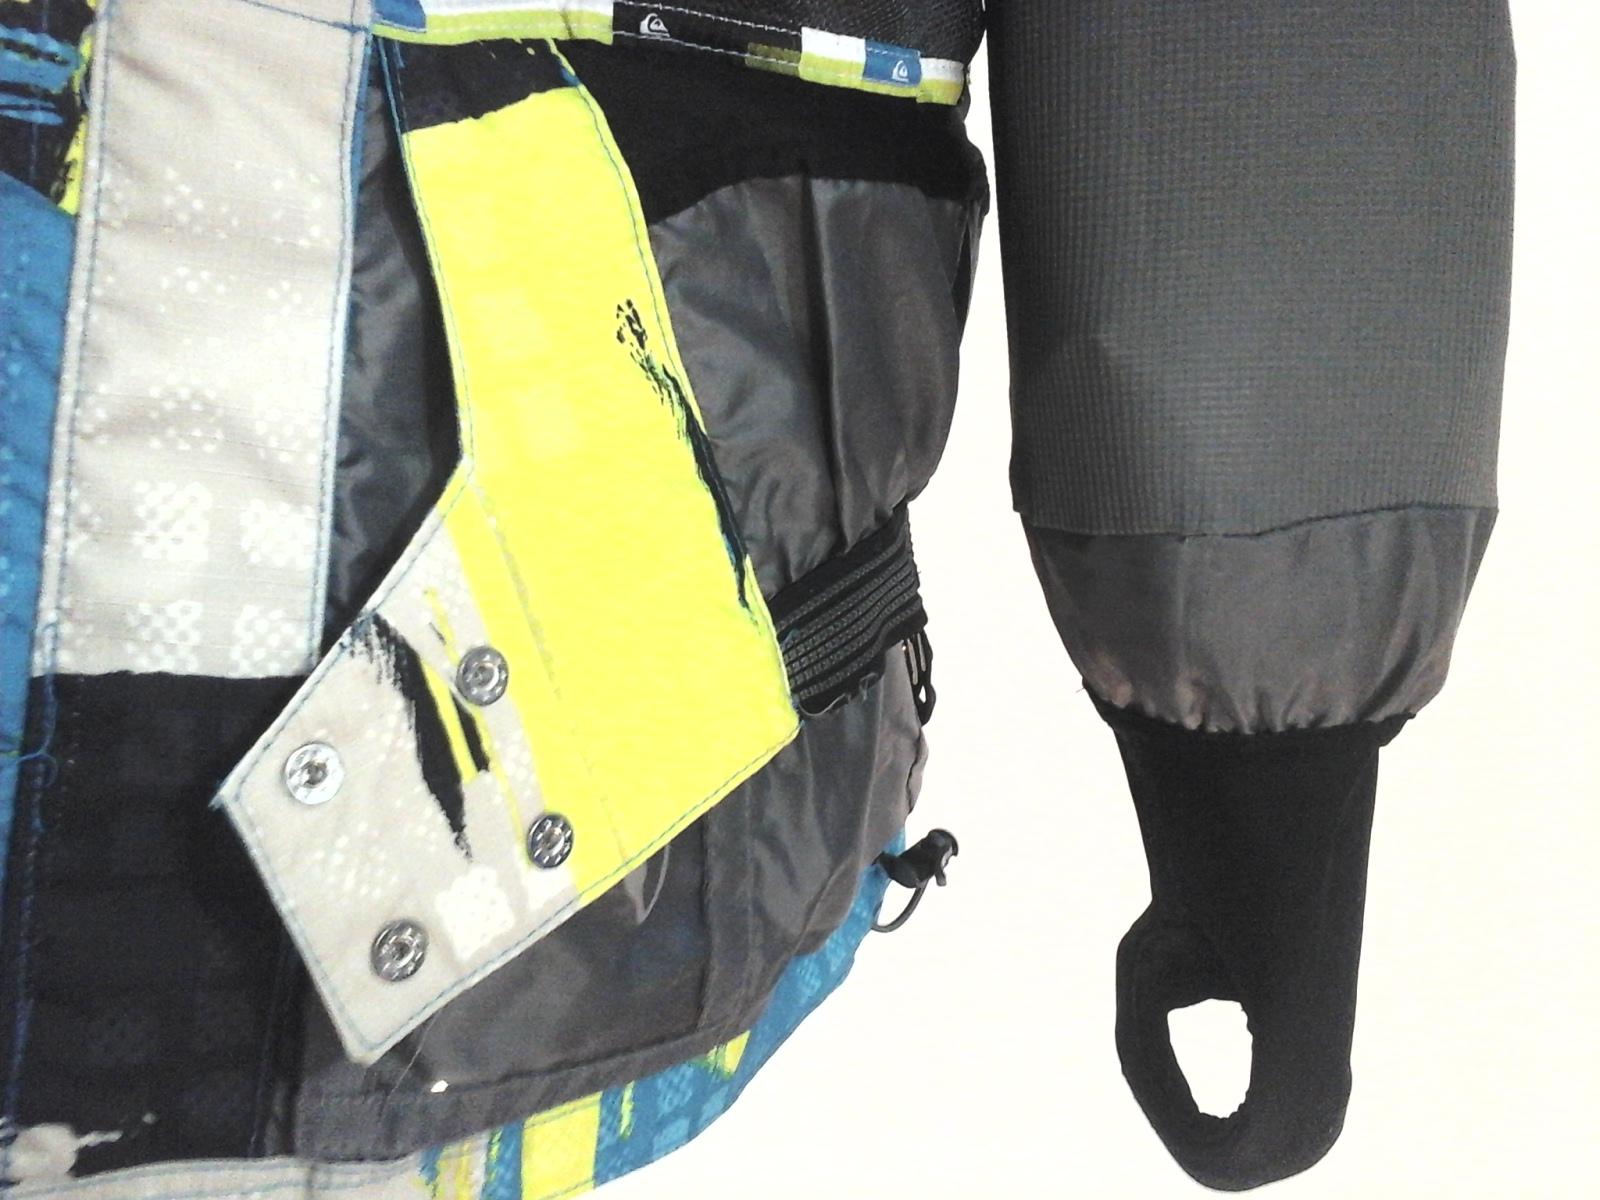 5f5f2a78d9ed QUICKSILVER Ski Snowboard Jacket Turquoise Yellow Black Print Hood ...